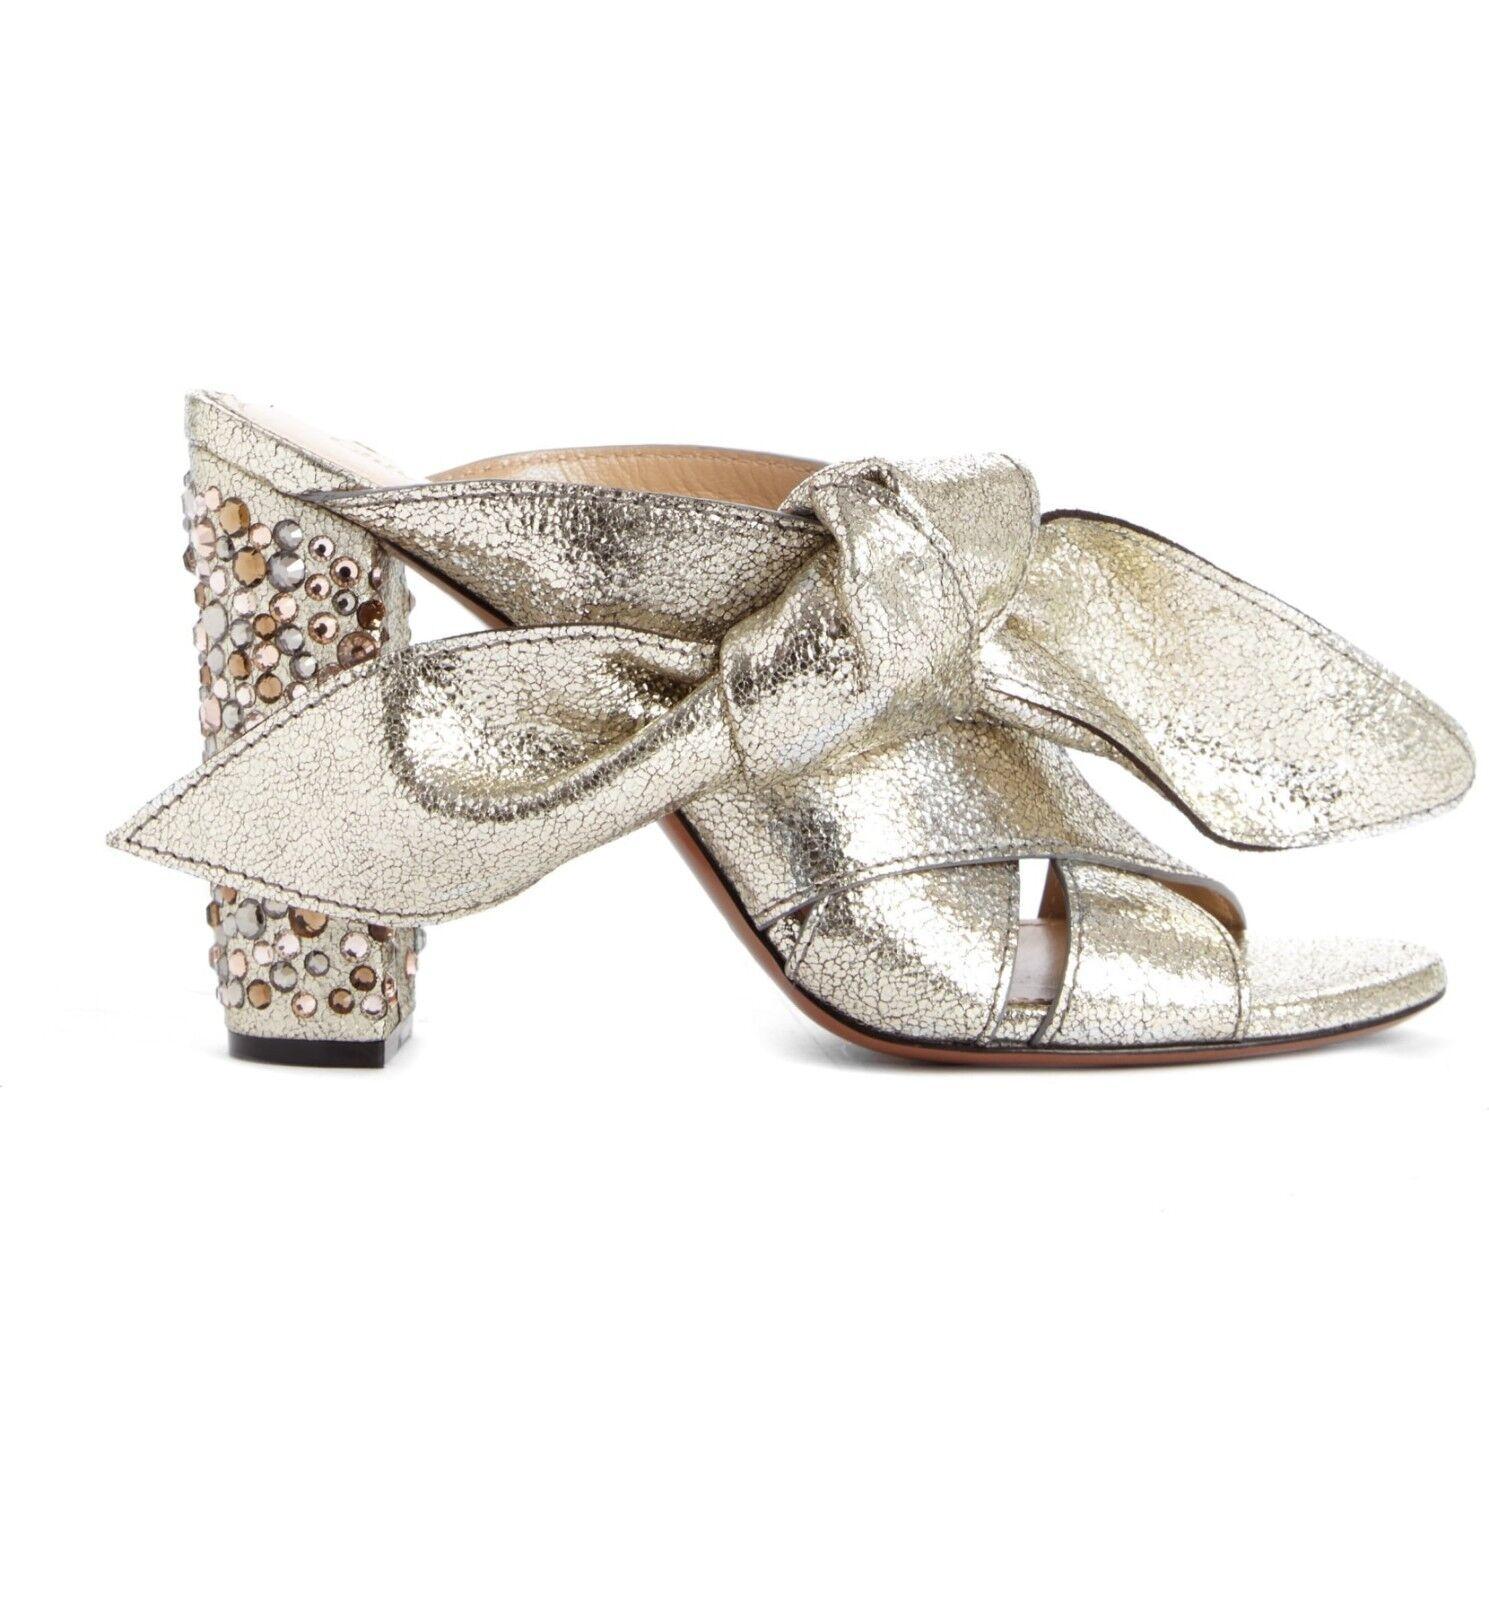 1,160 CHLOE Nellie Crystal Embalised Top Knot Block Sandal grå Glitter 7 -6.5